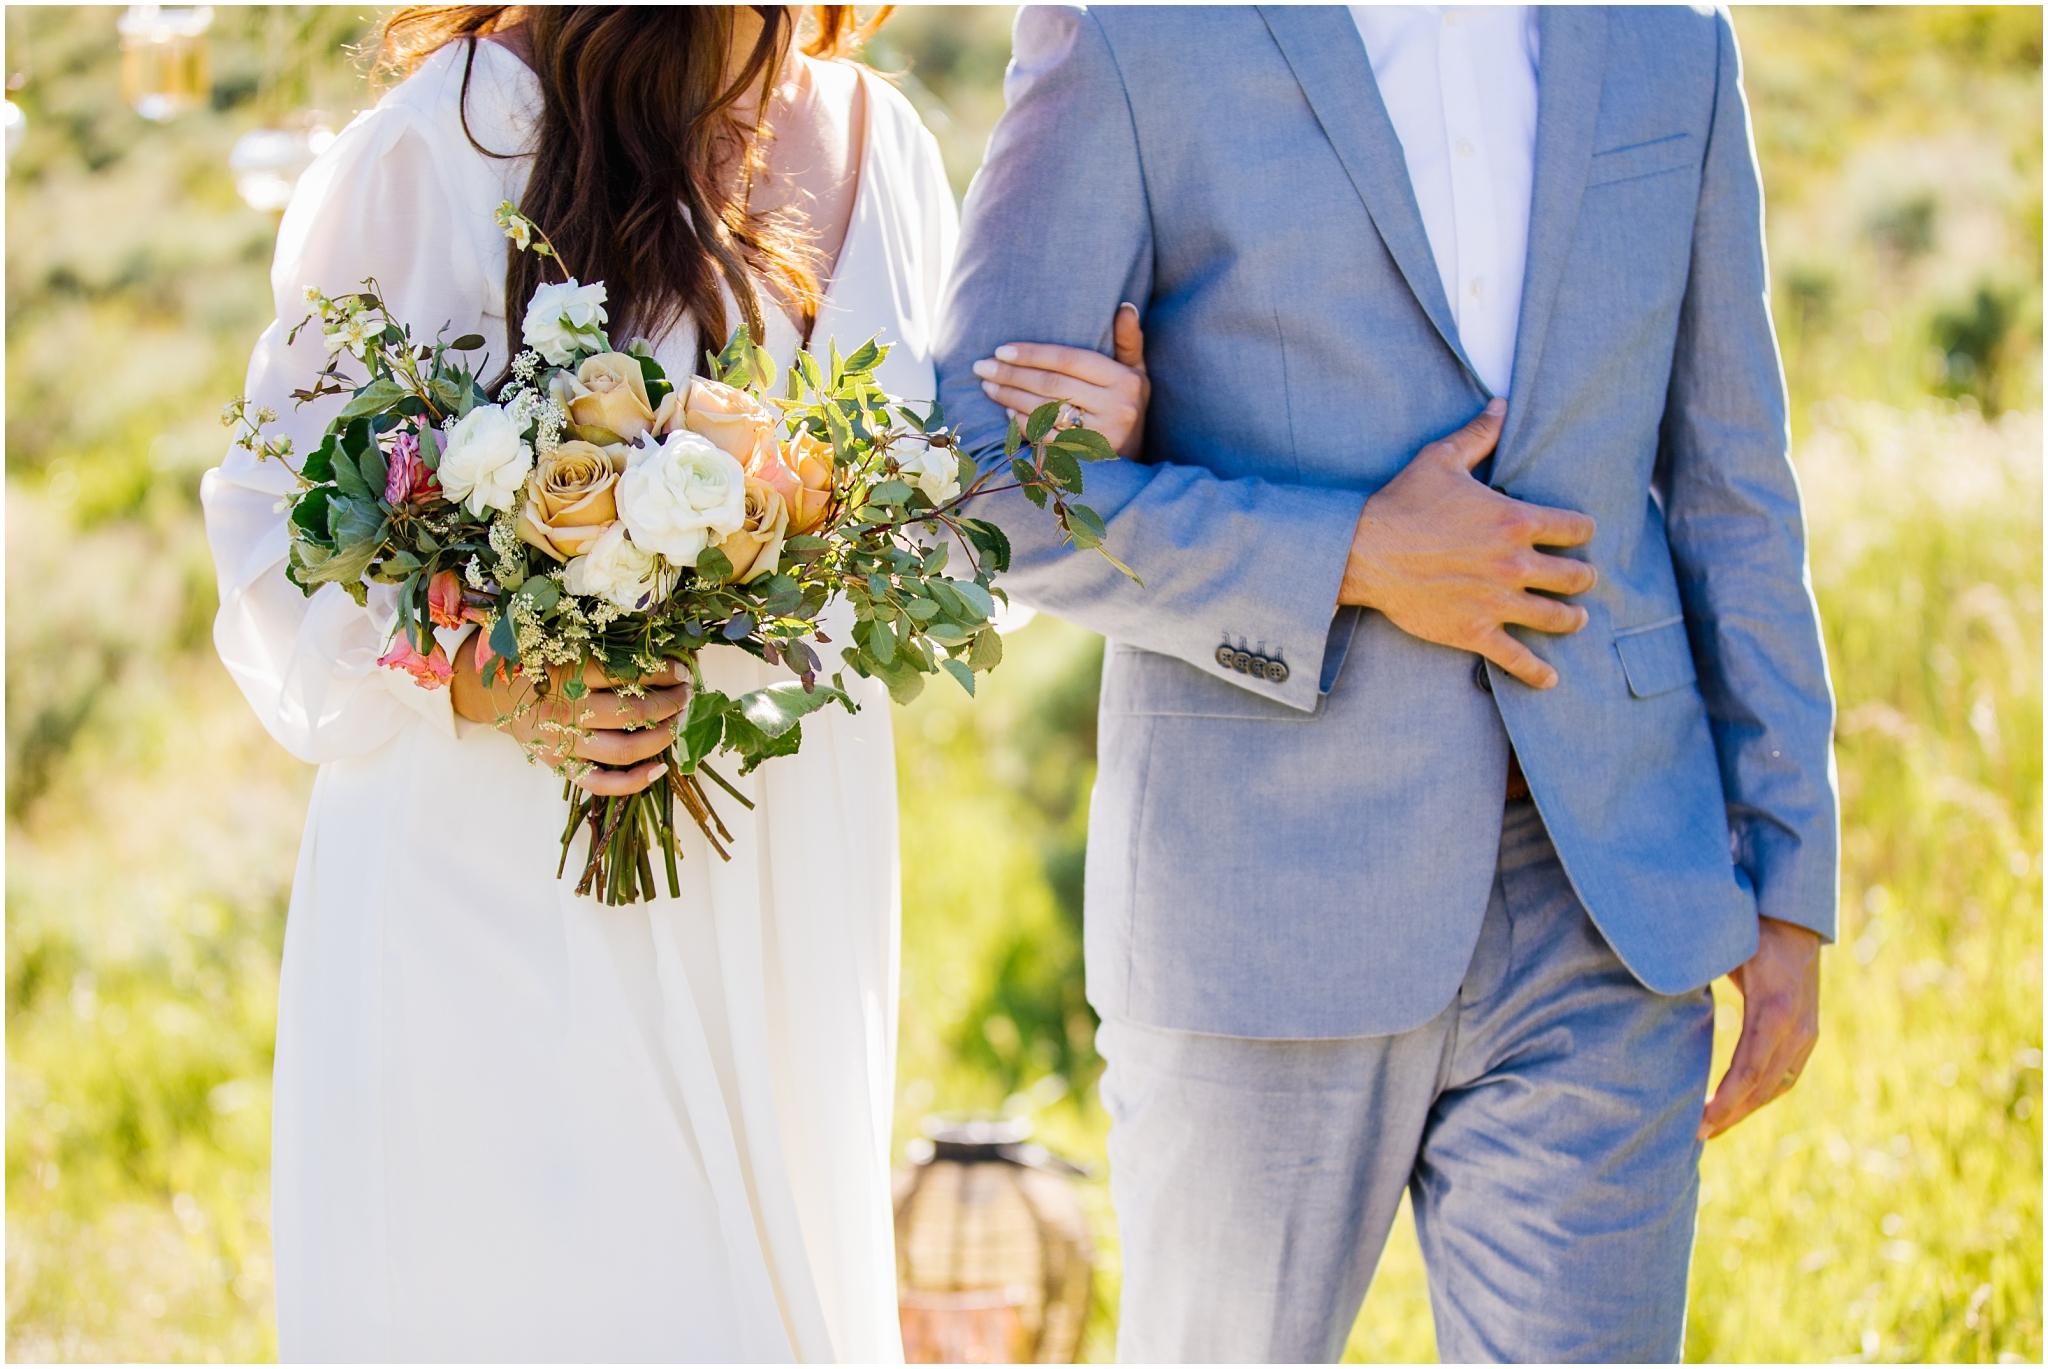 MountainShoot-26_Lizzie-B-Imagery-Utah-Wedding-Photographer-Salt-Lake-City-Park-City-Utah-County.jpg